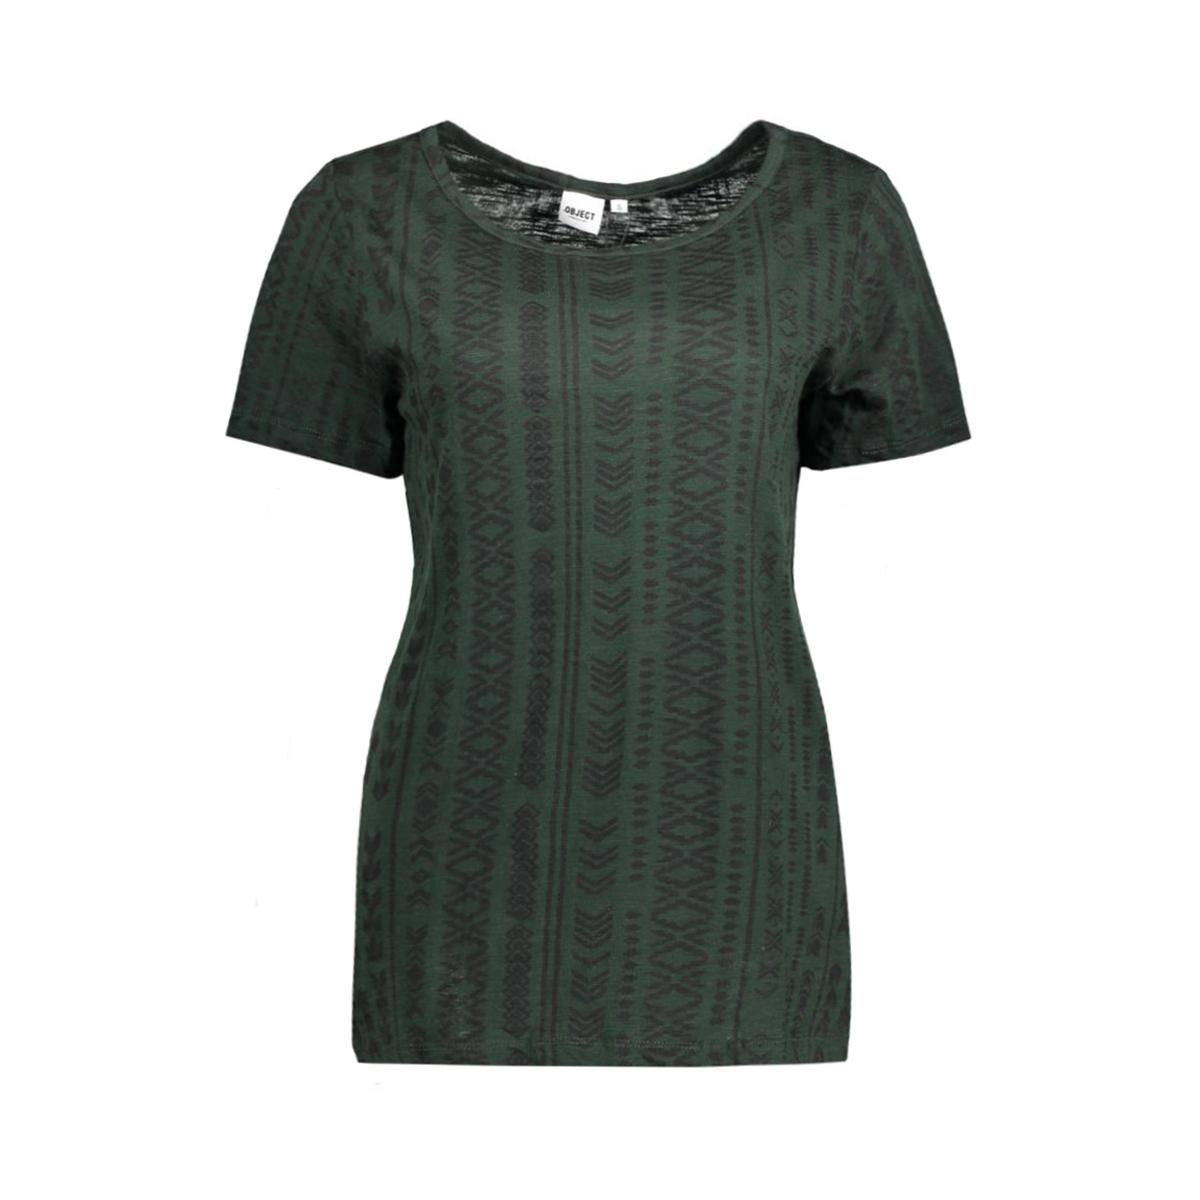 objisa s/s top fair 23022125 object t-shirt scarab